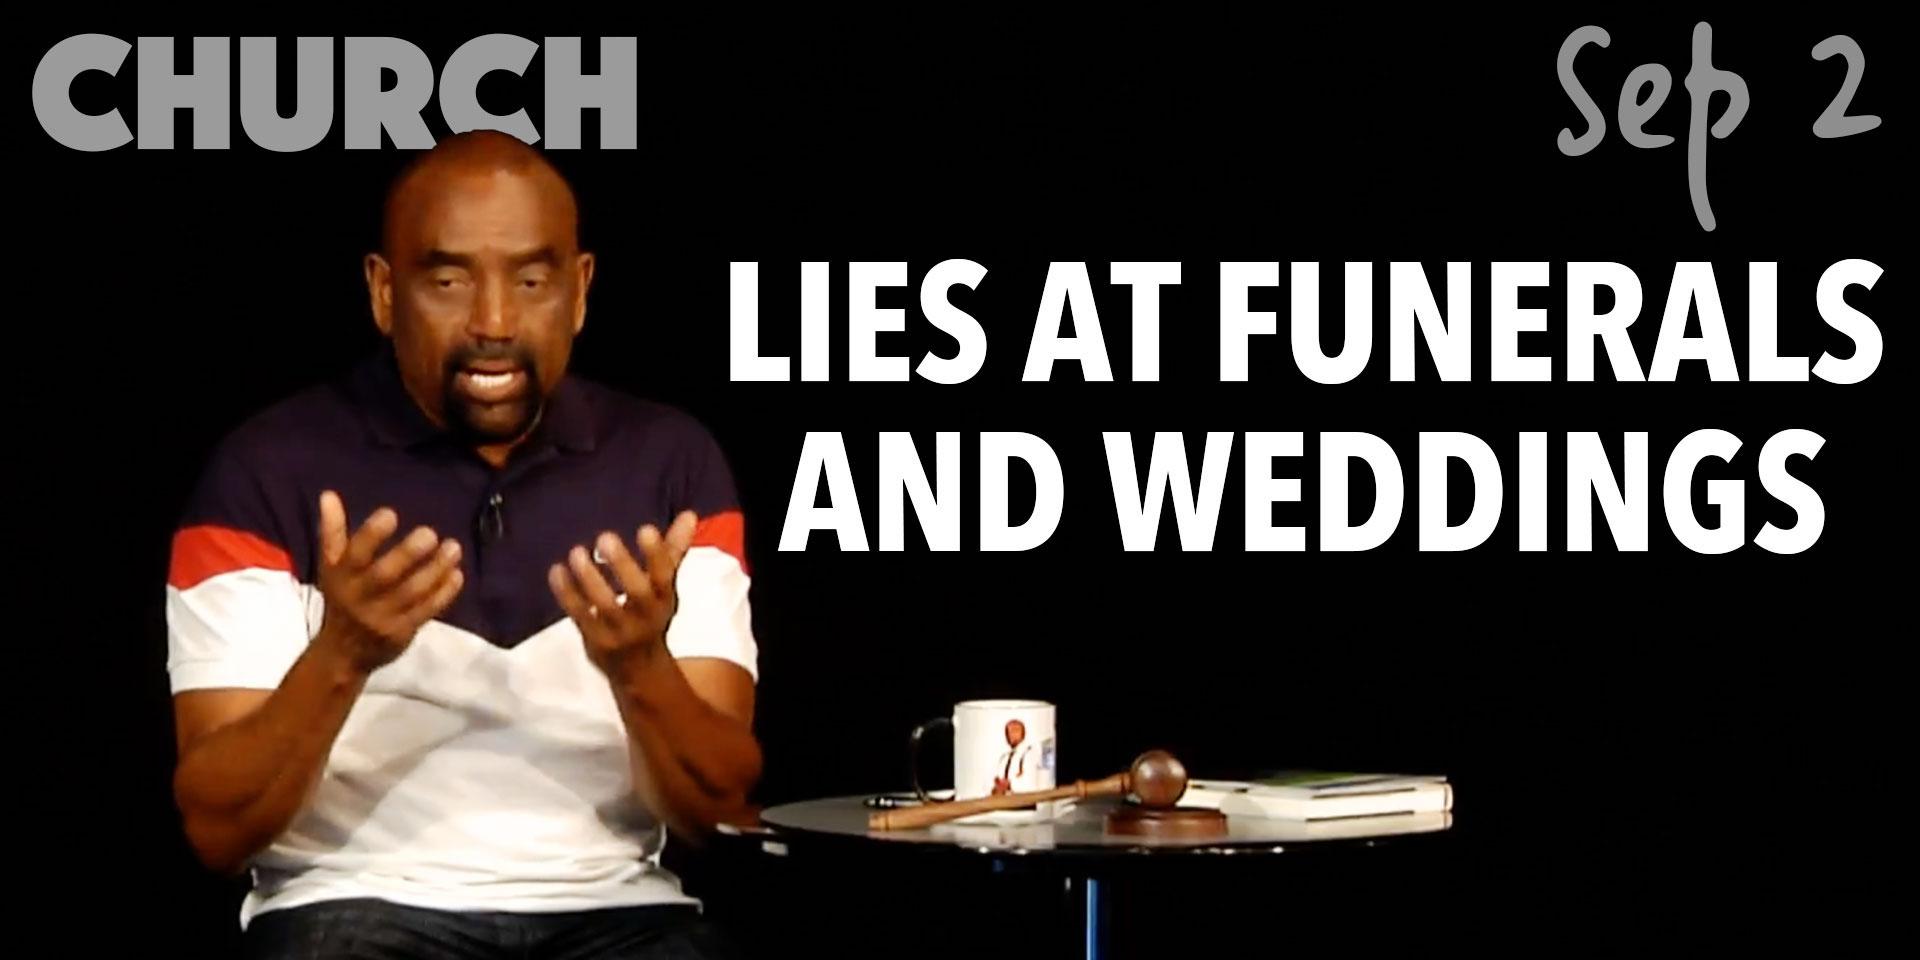 Lies at Funerals and Weddings (Church Sep 2)